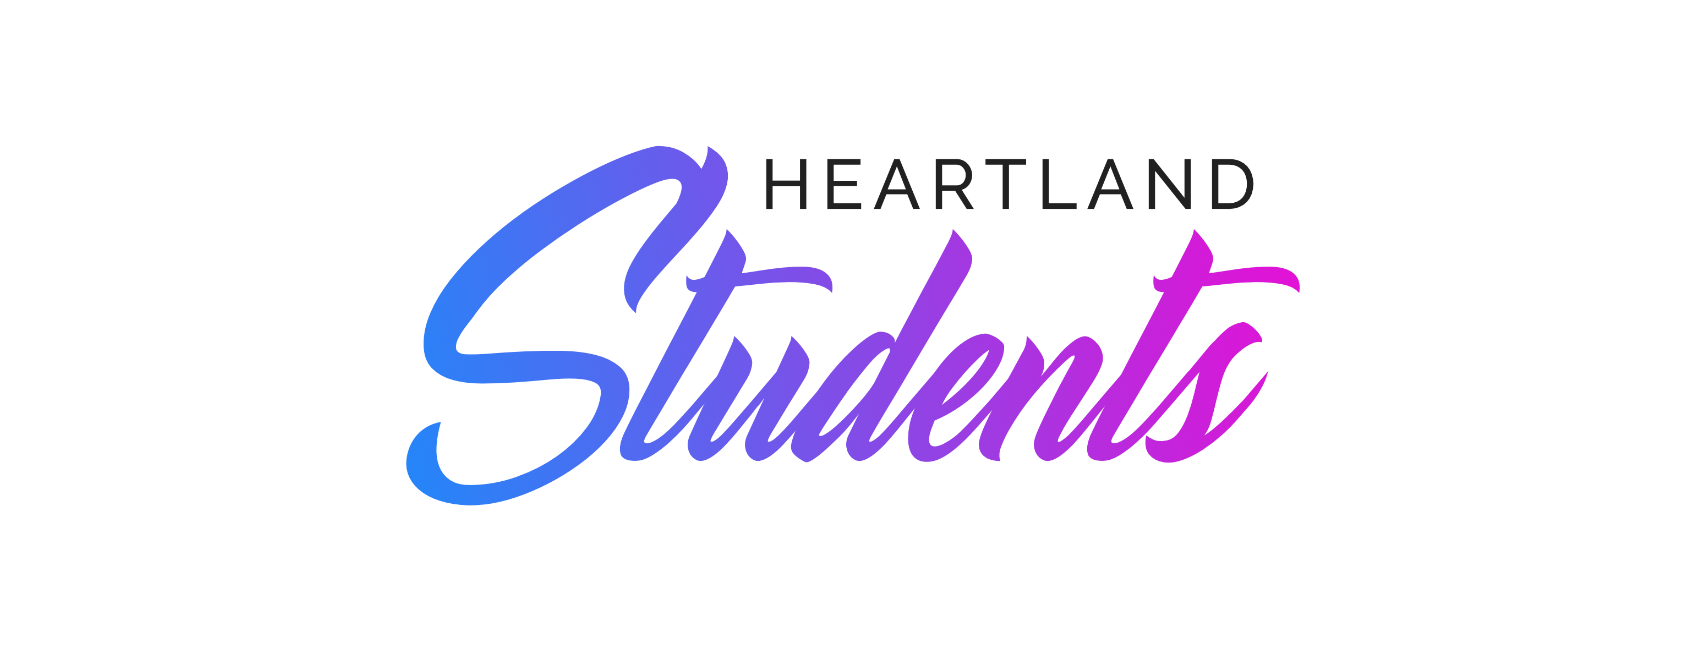 HEARTLAND STUDENT | GRADES 6-12